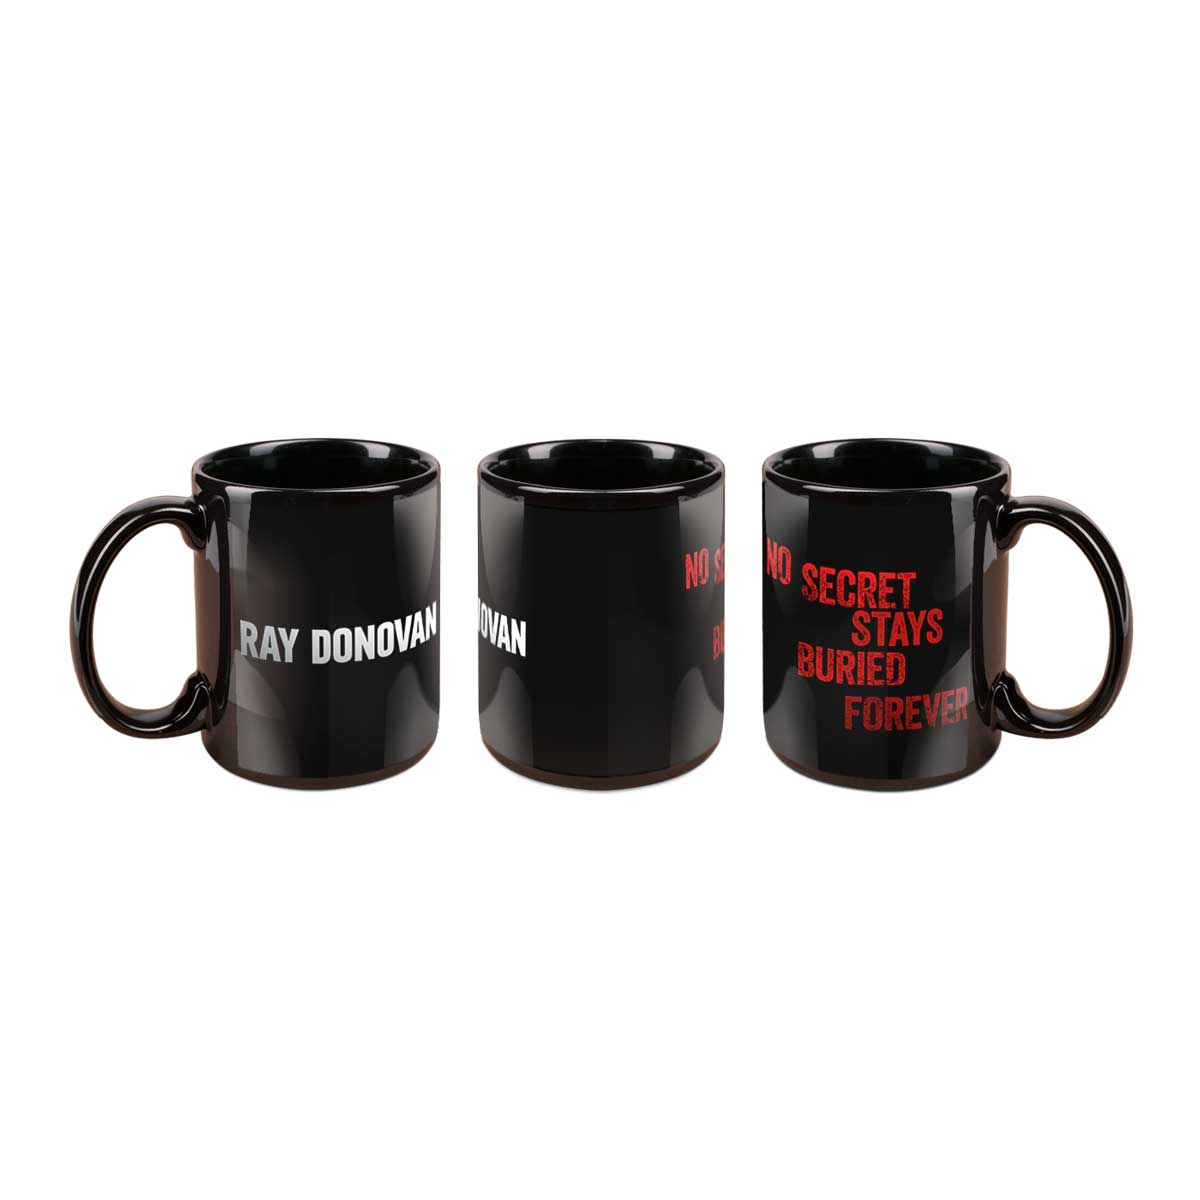 Ray Donovan Secrets Mug